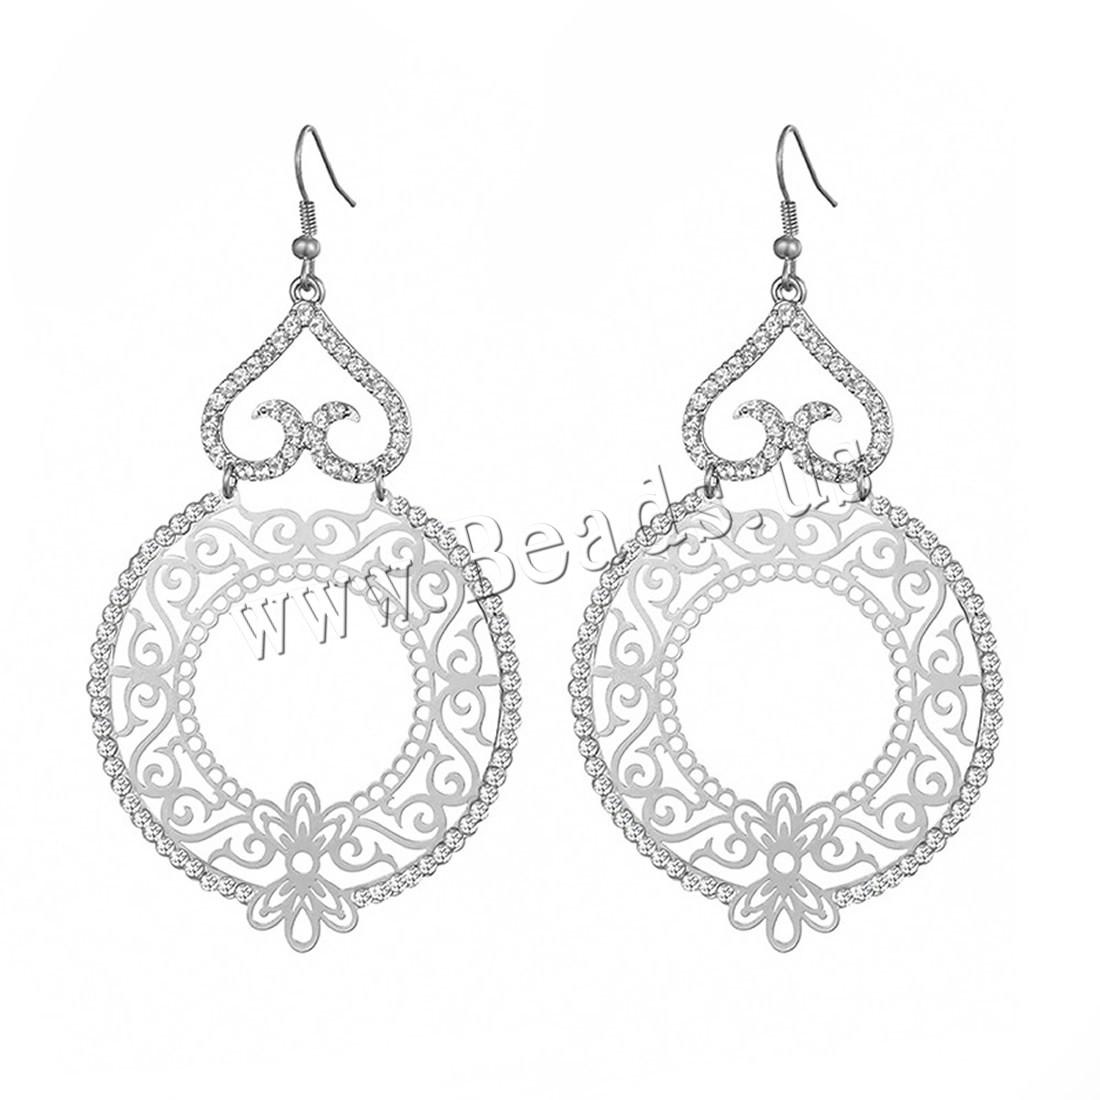 Buy Rhinestone Earring Zinc Alloy iron earring hook platinum color plated woman & rhinestone lead & cadmium free 75mm Sold Pair